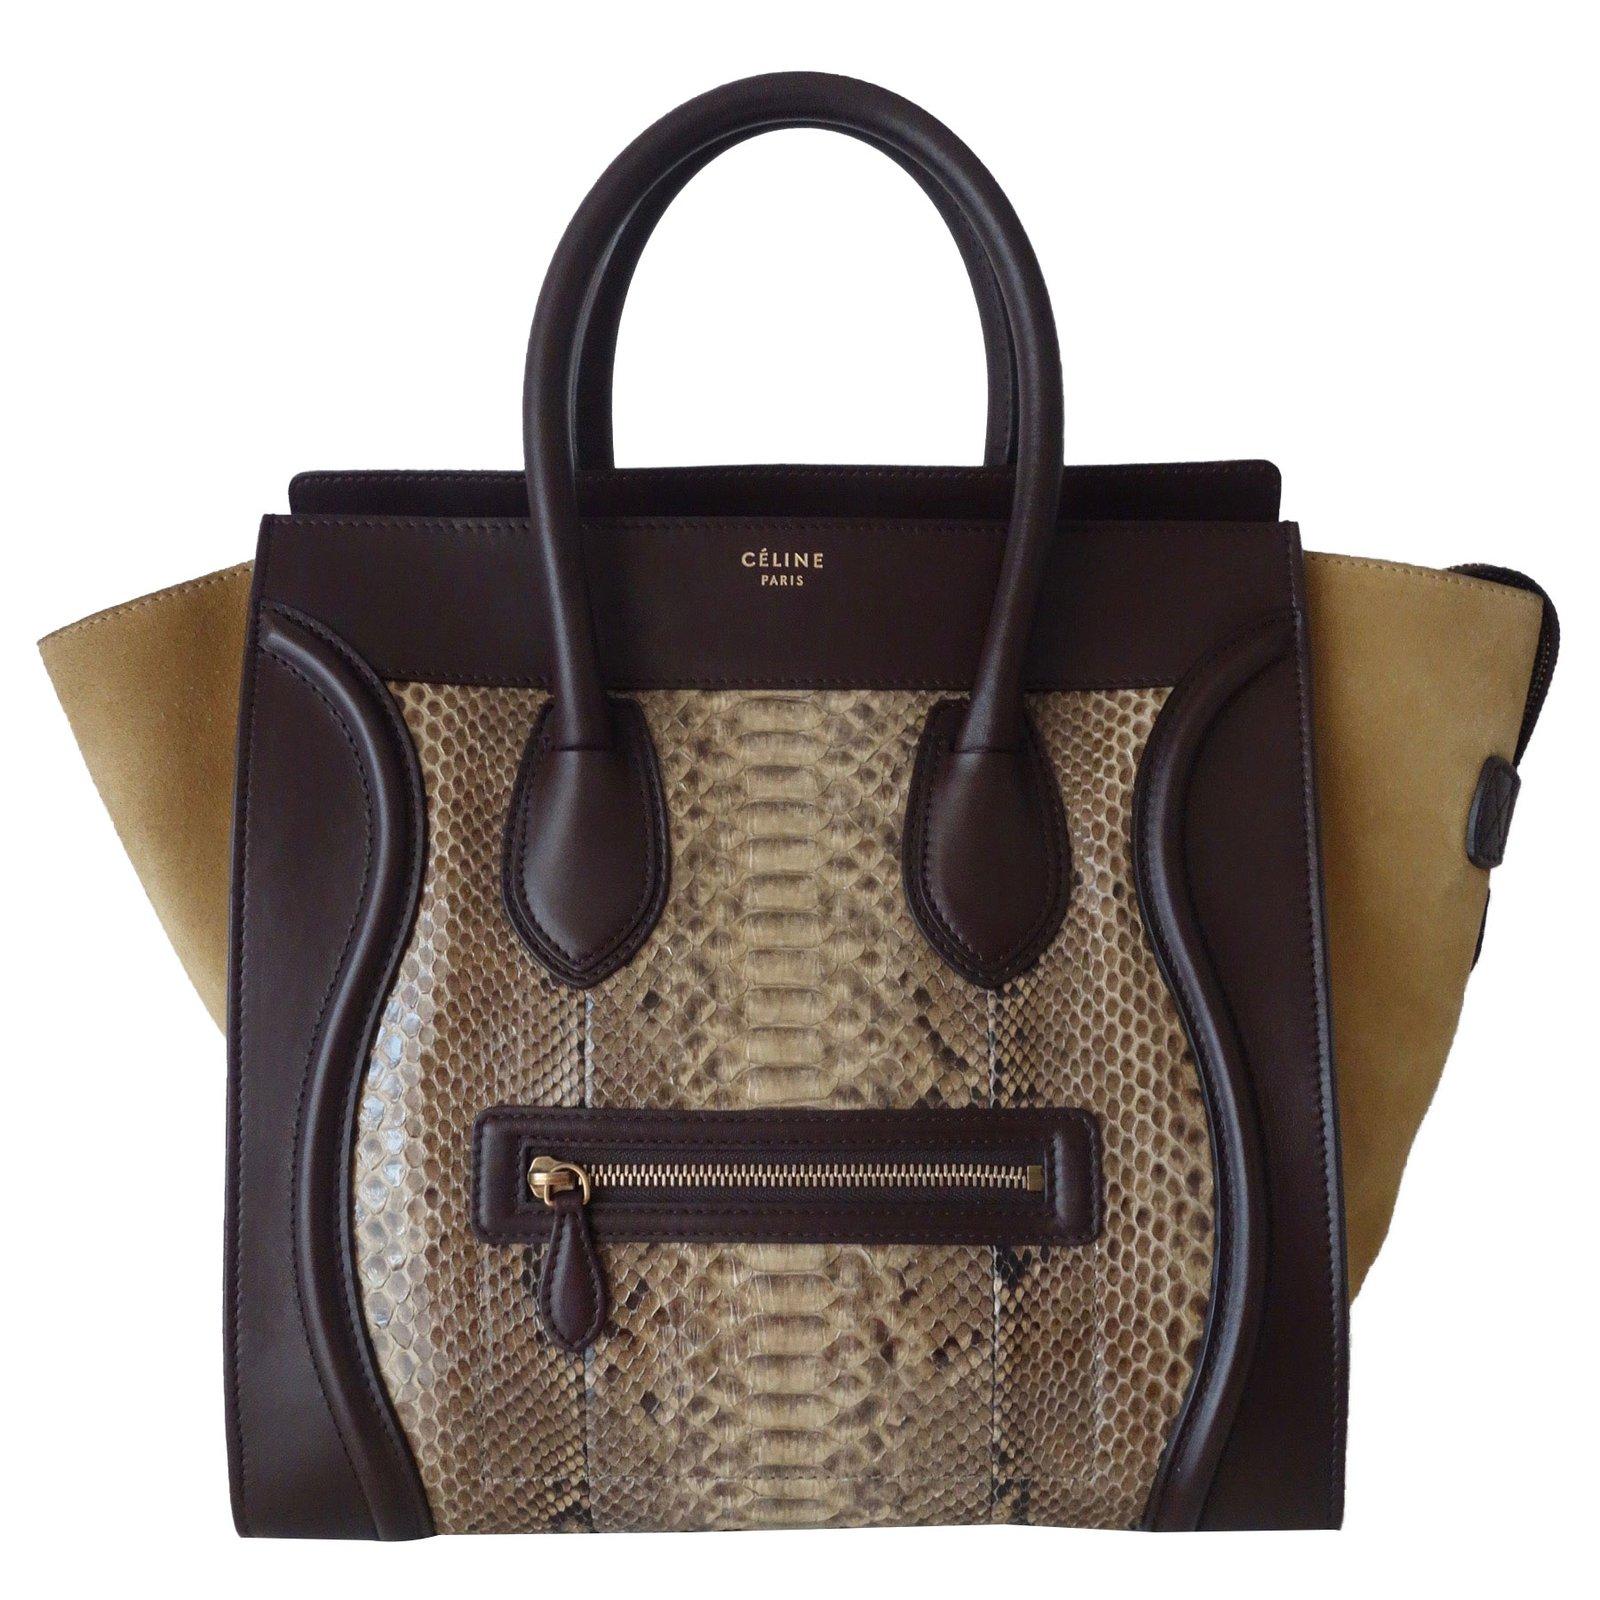 Céline Celine Luge Python Handbags Leather Brown Mustard Ref 57357